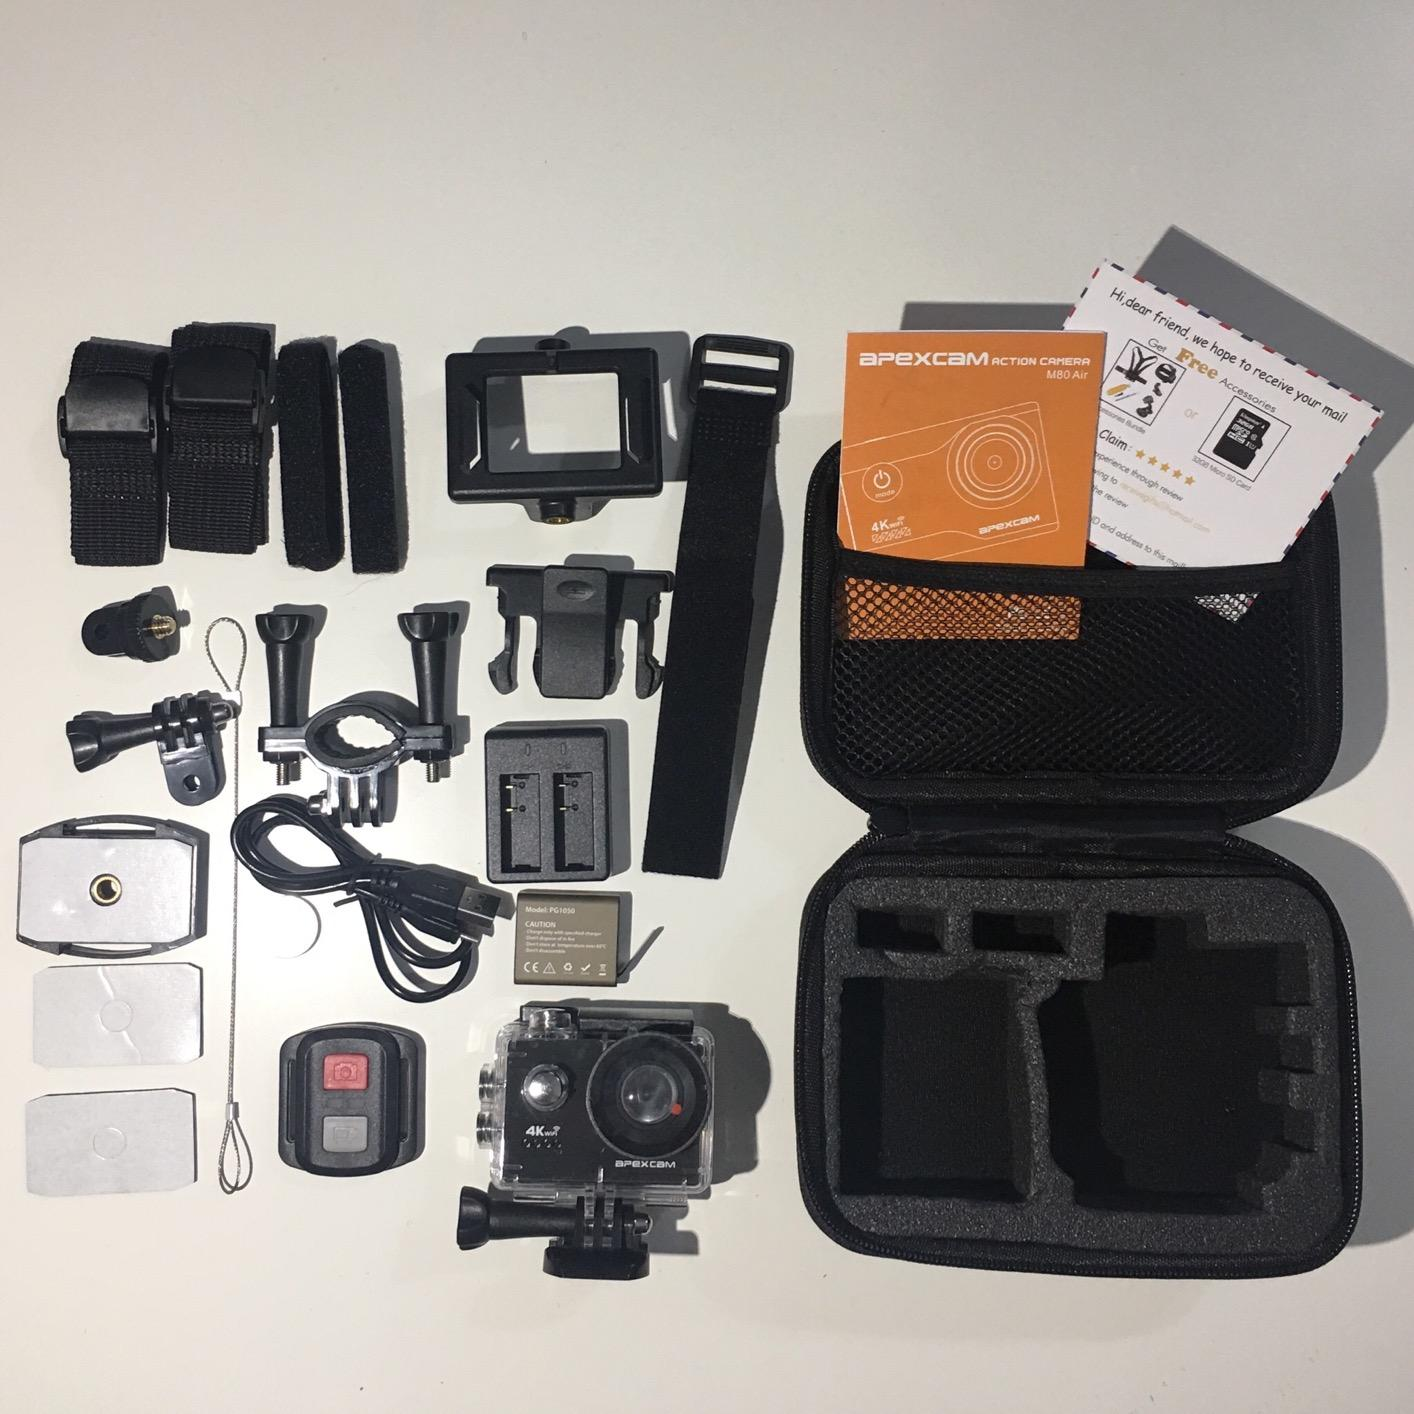 Apexcam 4K Action Camera 16MP Underwater Waterproof Camera